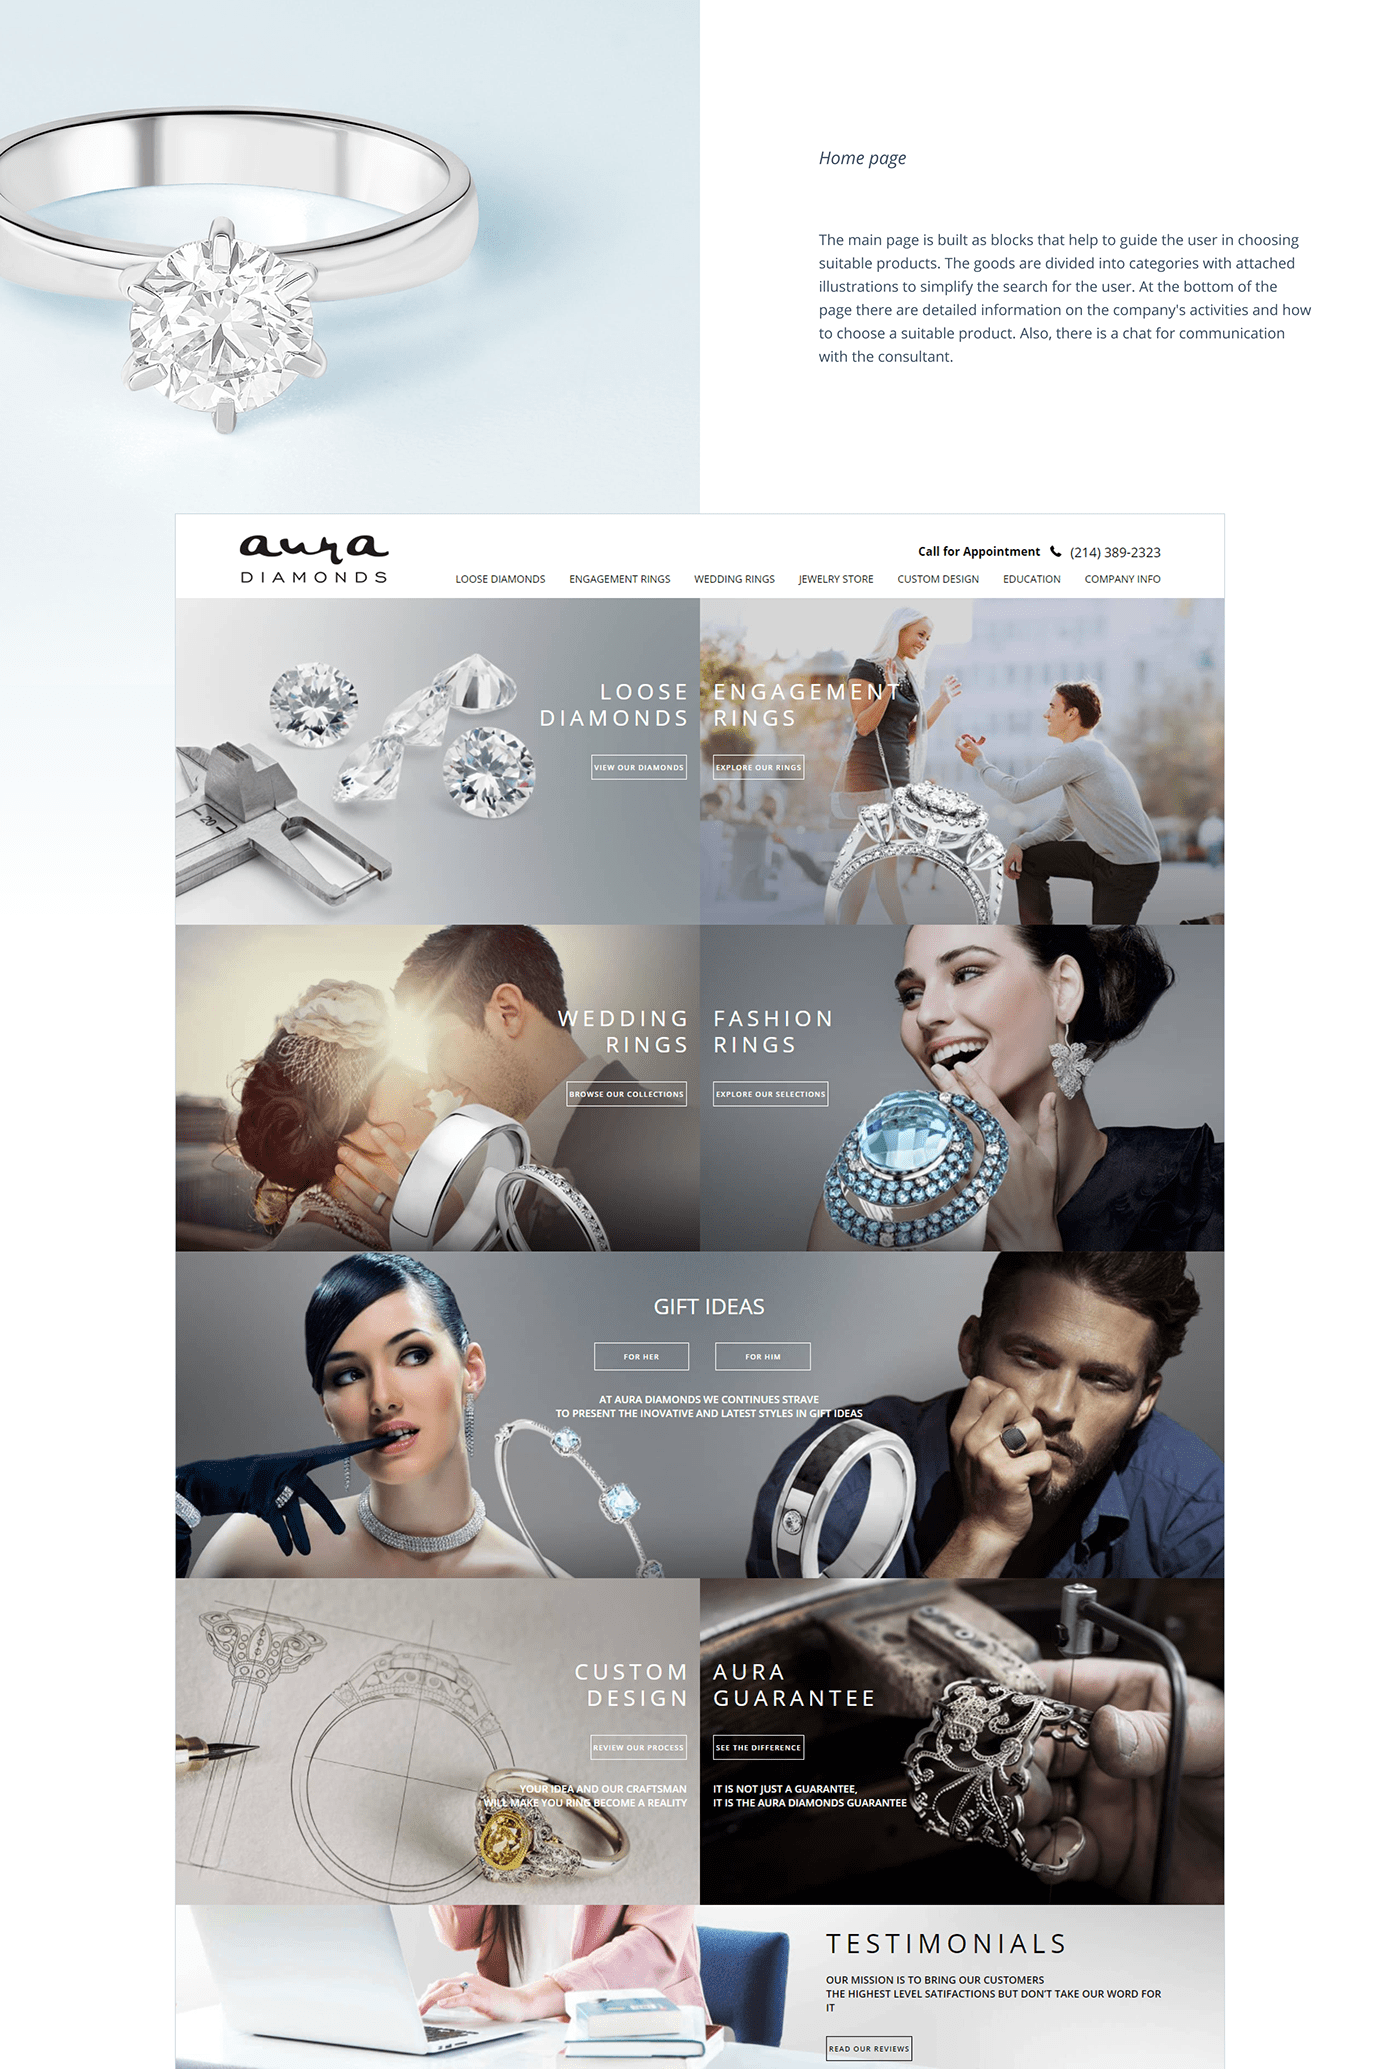 Adaptive Aura design diamonds jewelry site store UI/UX vis-a-vis Web